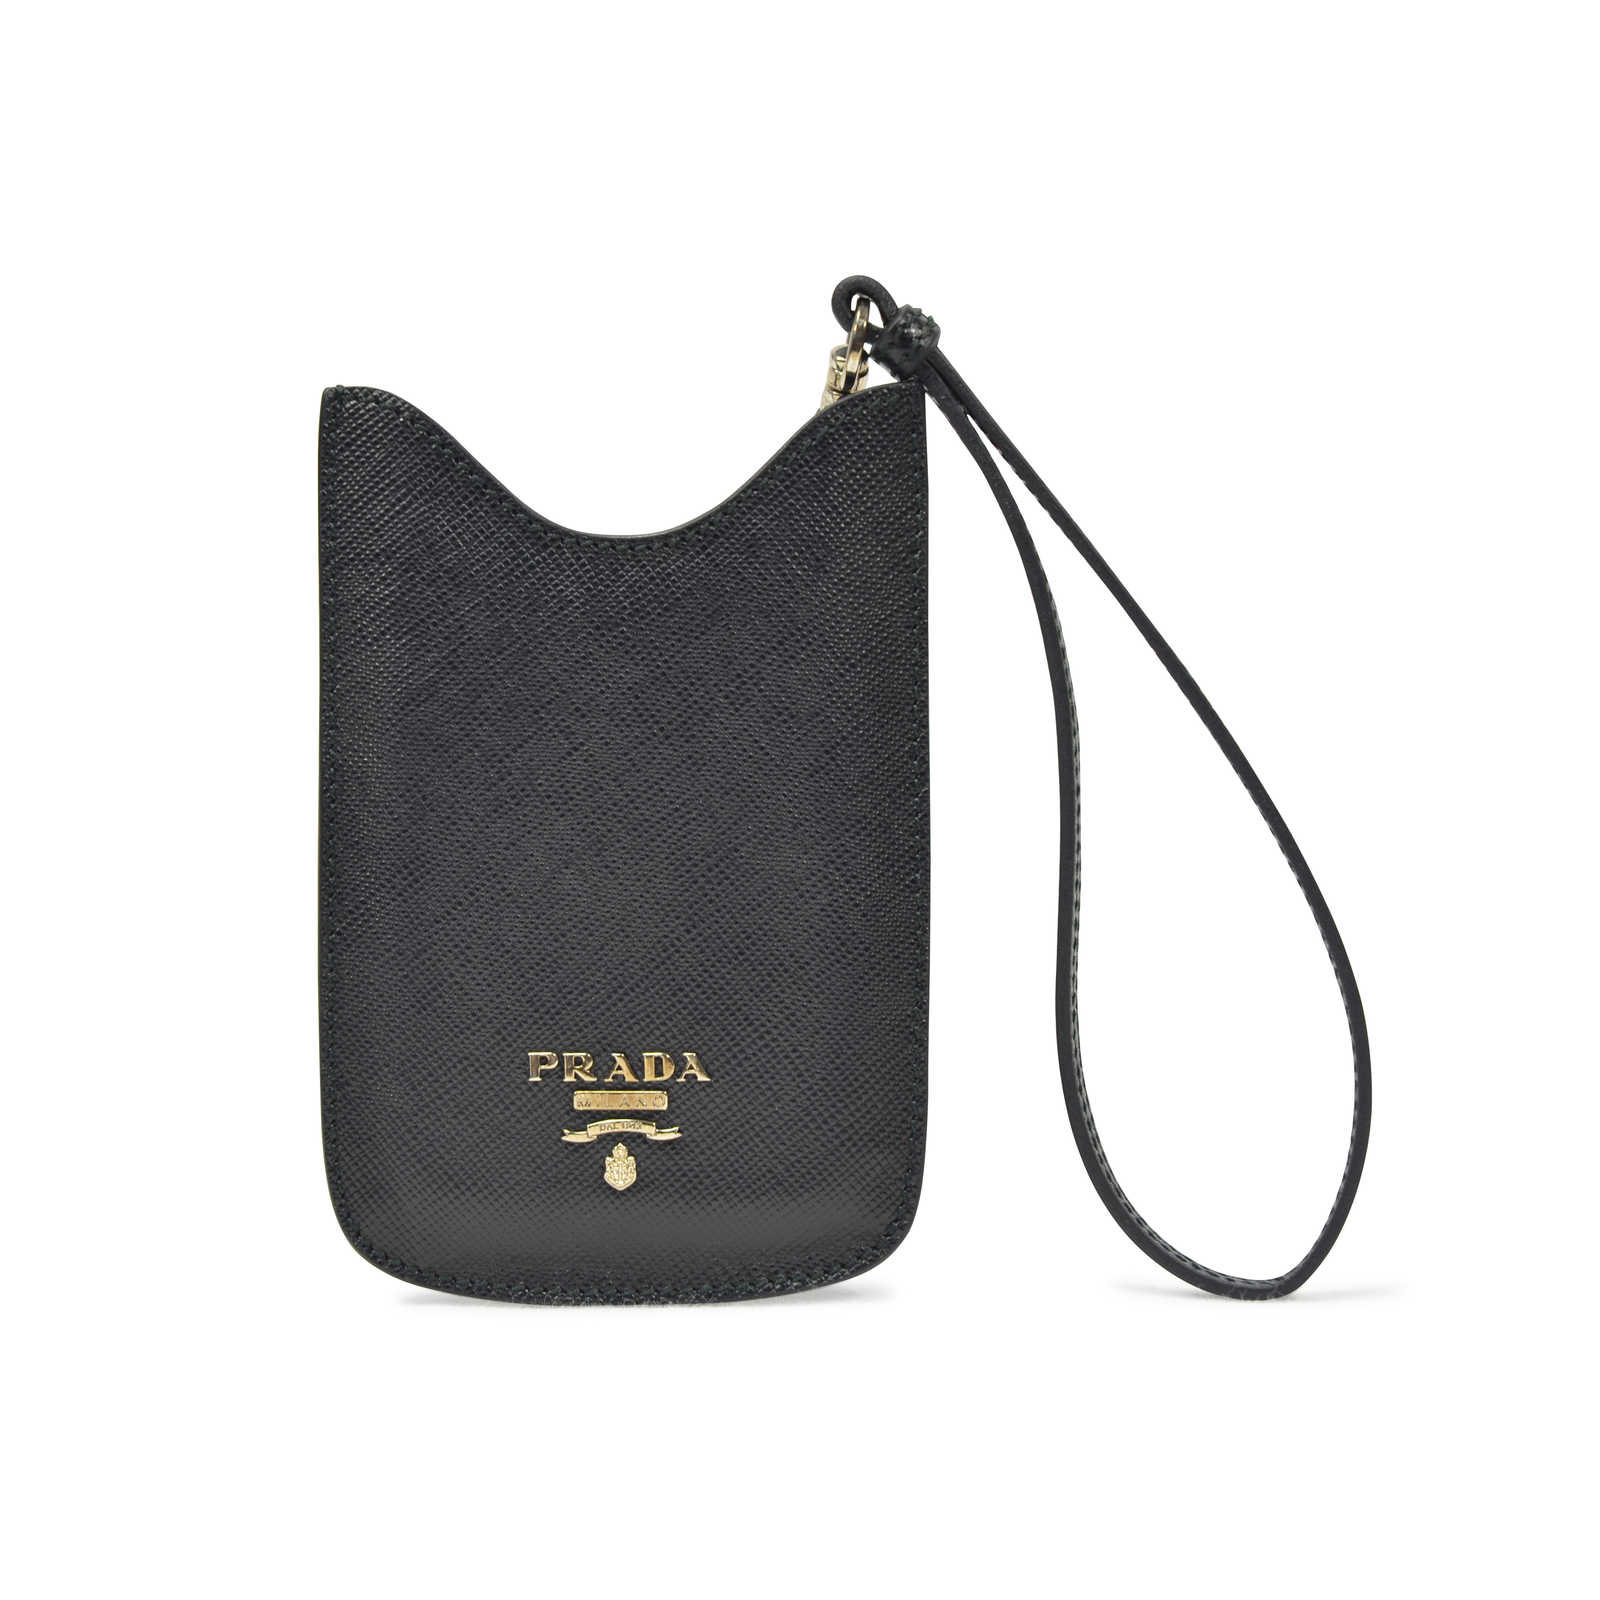 7a244c87bdb8 Authentic Second Hand Prada Black Phone/Card Case Wristlet (PSS-193-00087  ...